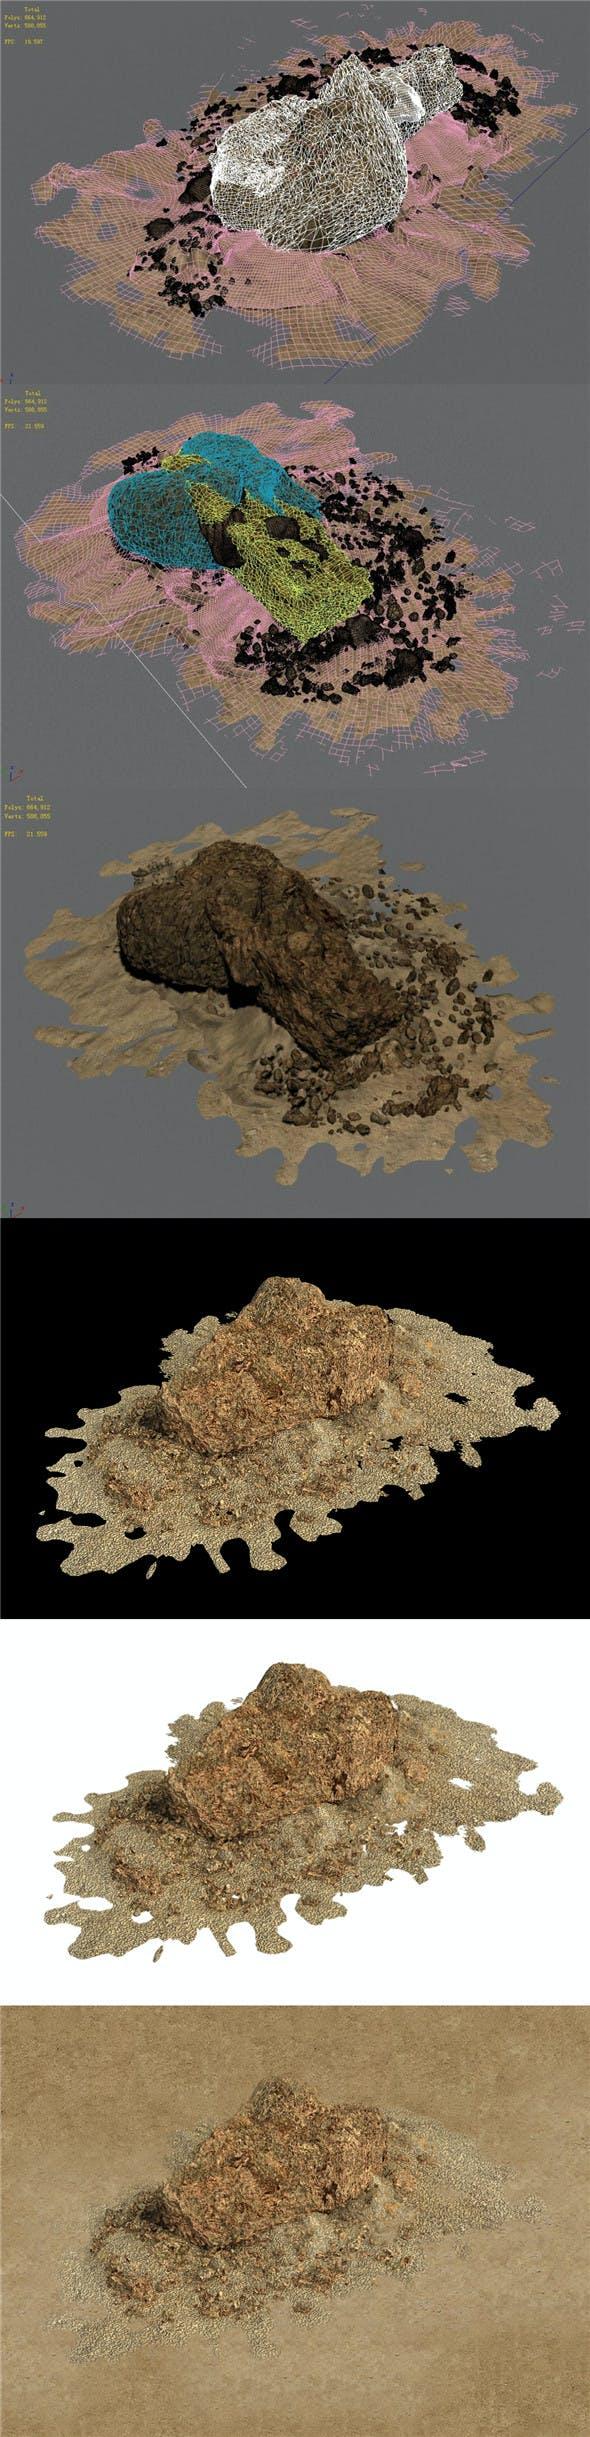 Barracks - Desert Stones - Crushed Stone 02 - 3DOcean Item for Sale